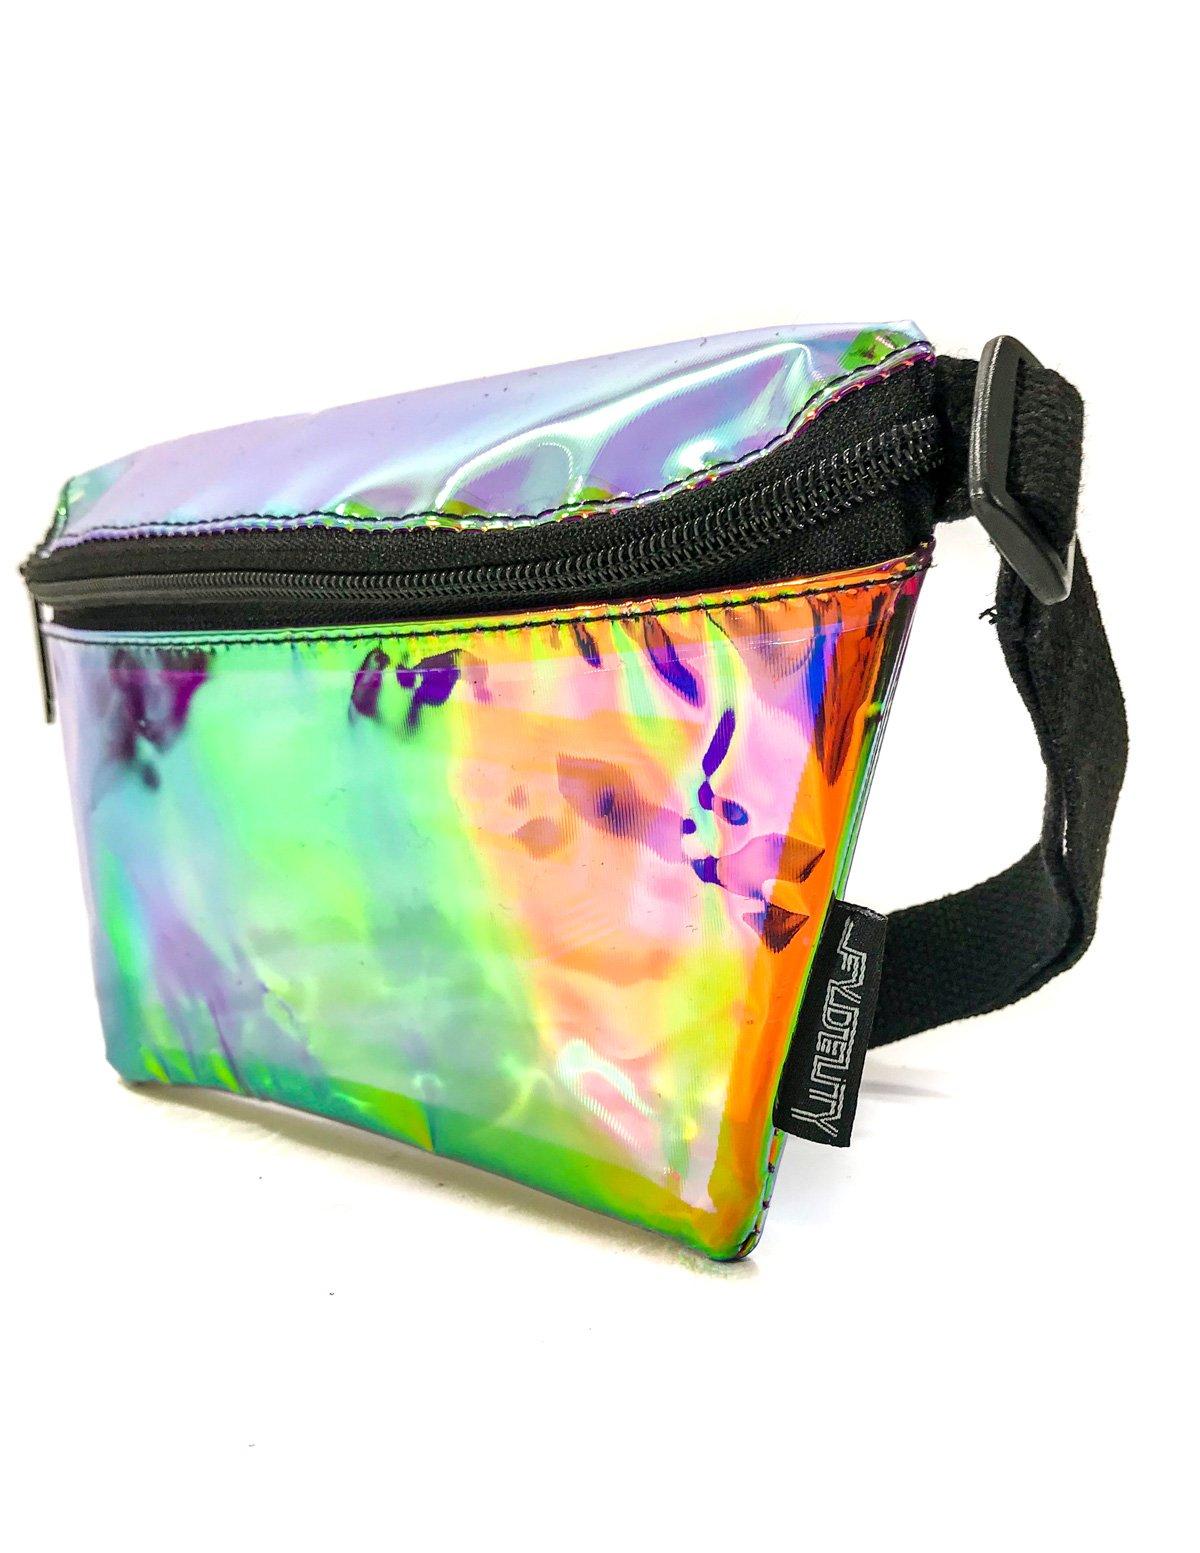 FYDELITY- Ultra-Slim Fanny Pack: PLASMA ELECTRO PURPLE | Transparent, Translucent, Iridescent, Holographic, Clear, Rainbow, Rave, EDM